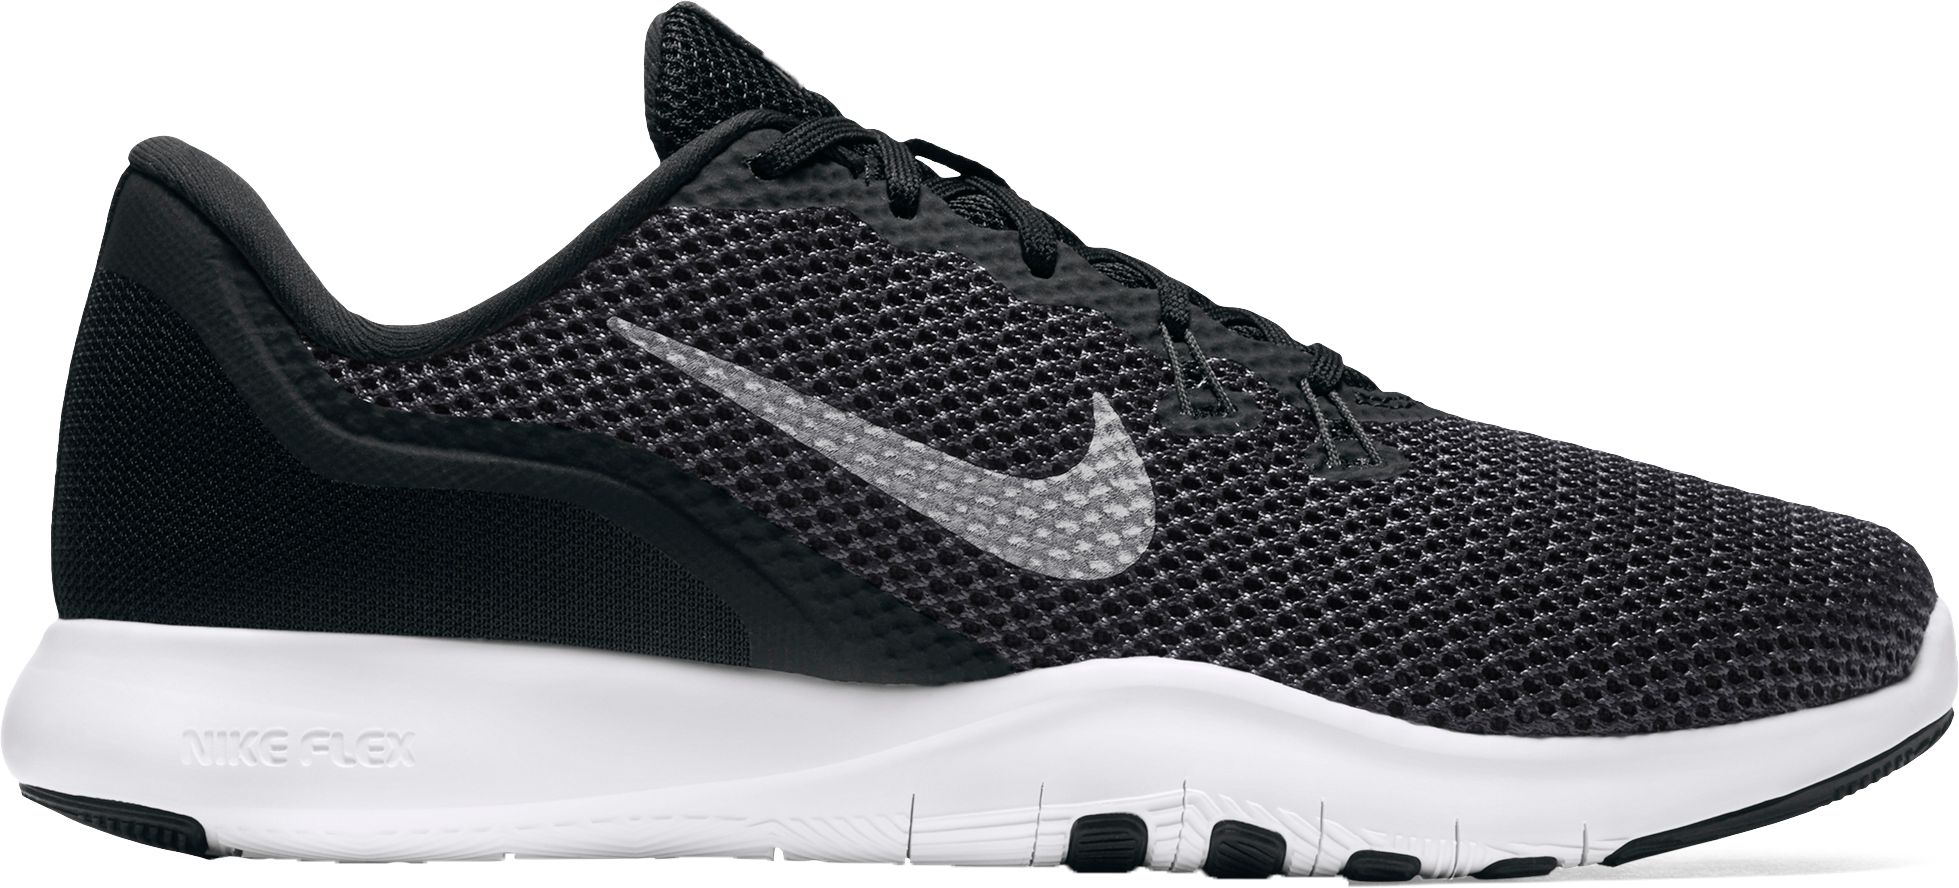 Nike Flex Trainer 7 Athletic Sneaker a2w0cXot